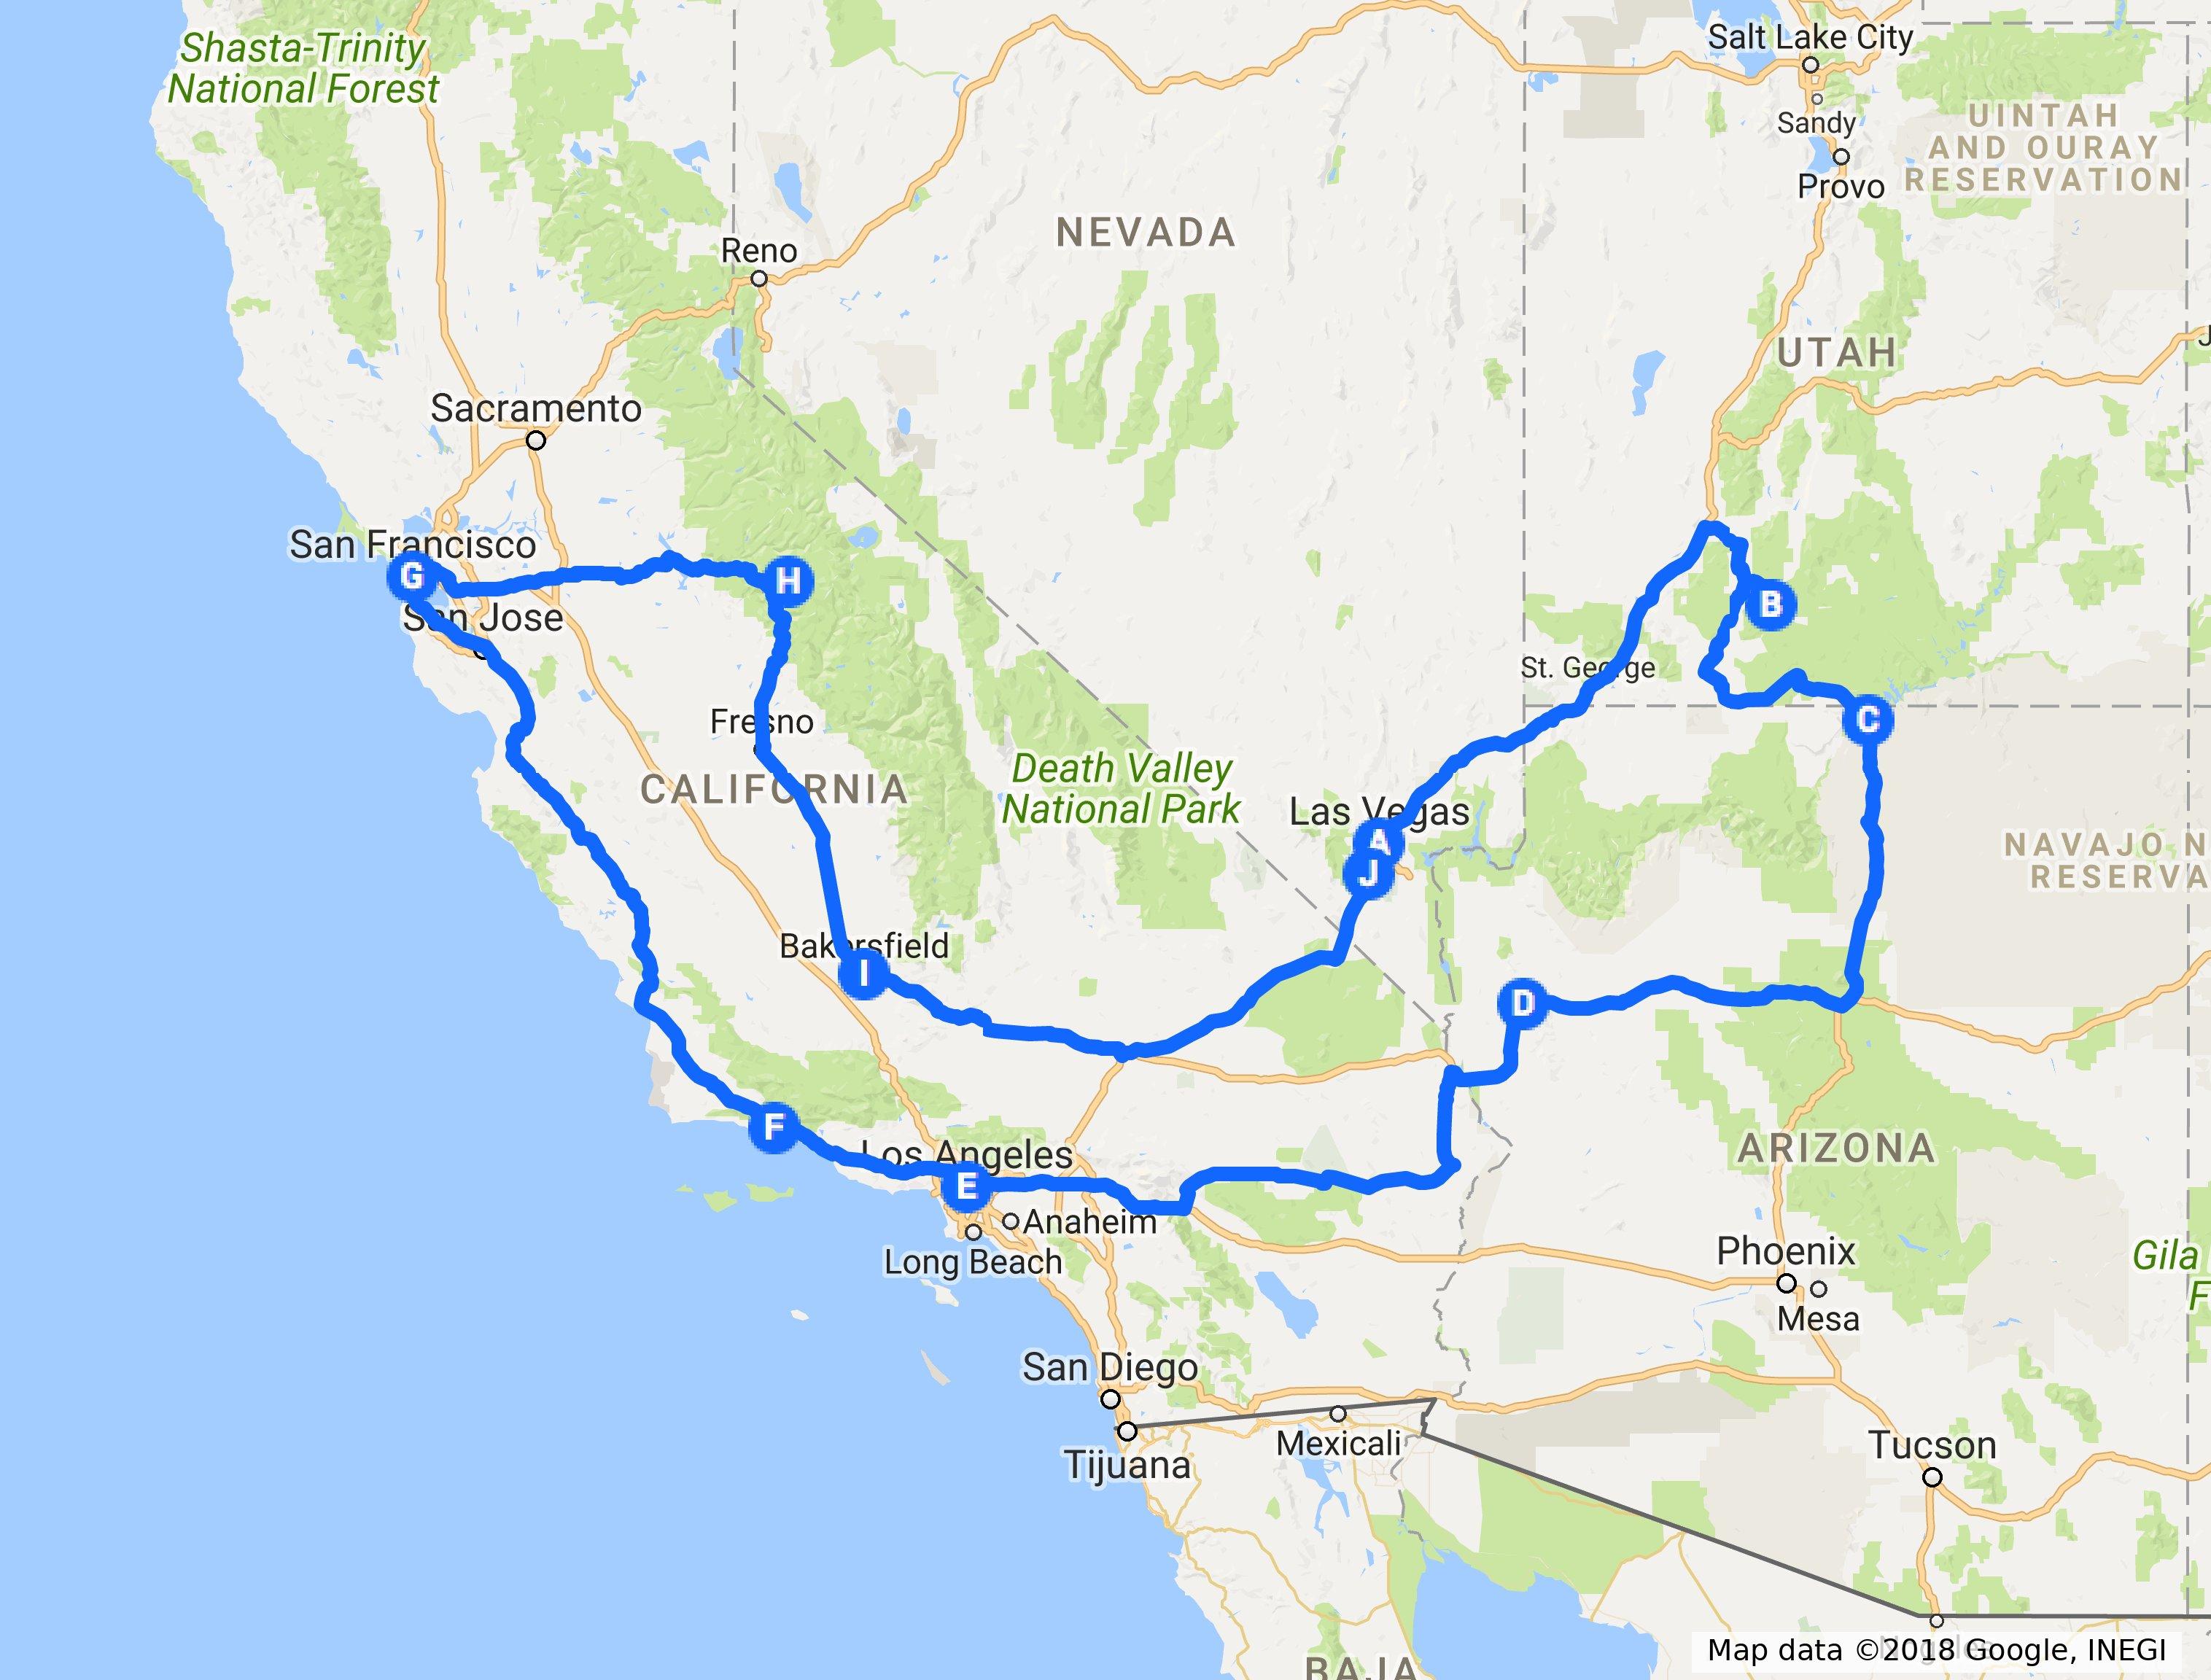 route road trip west amerika 2018